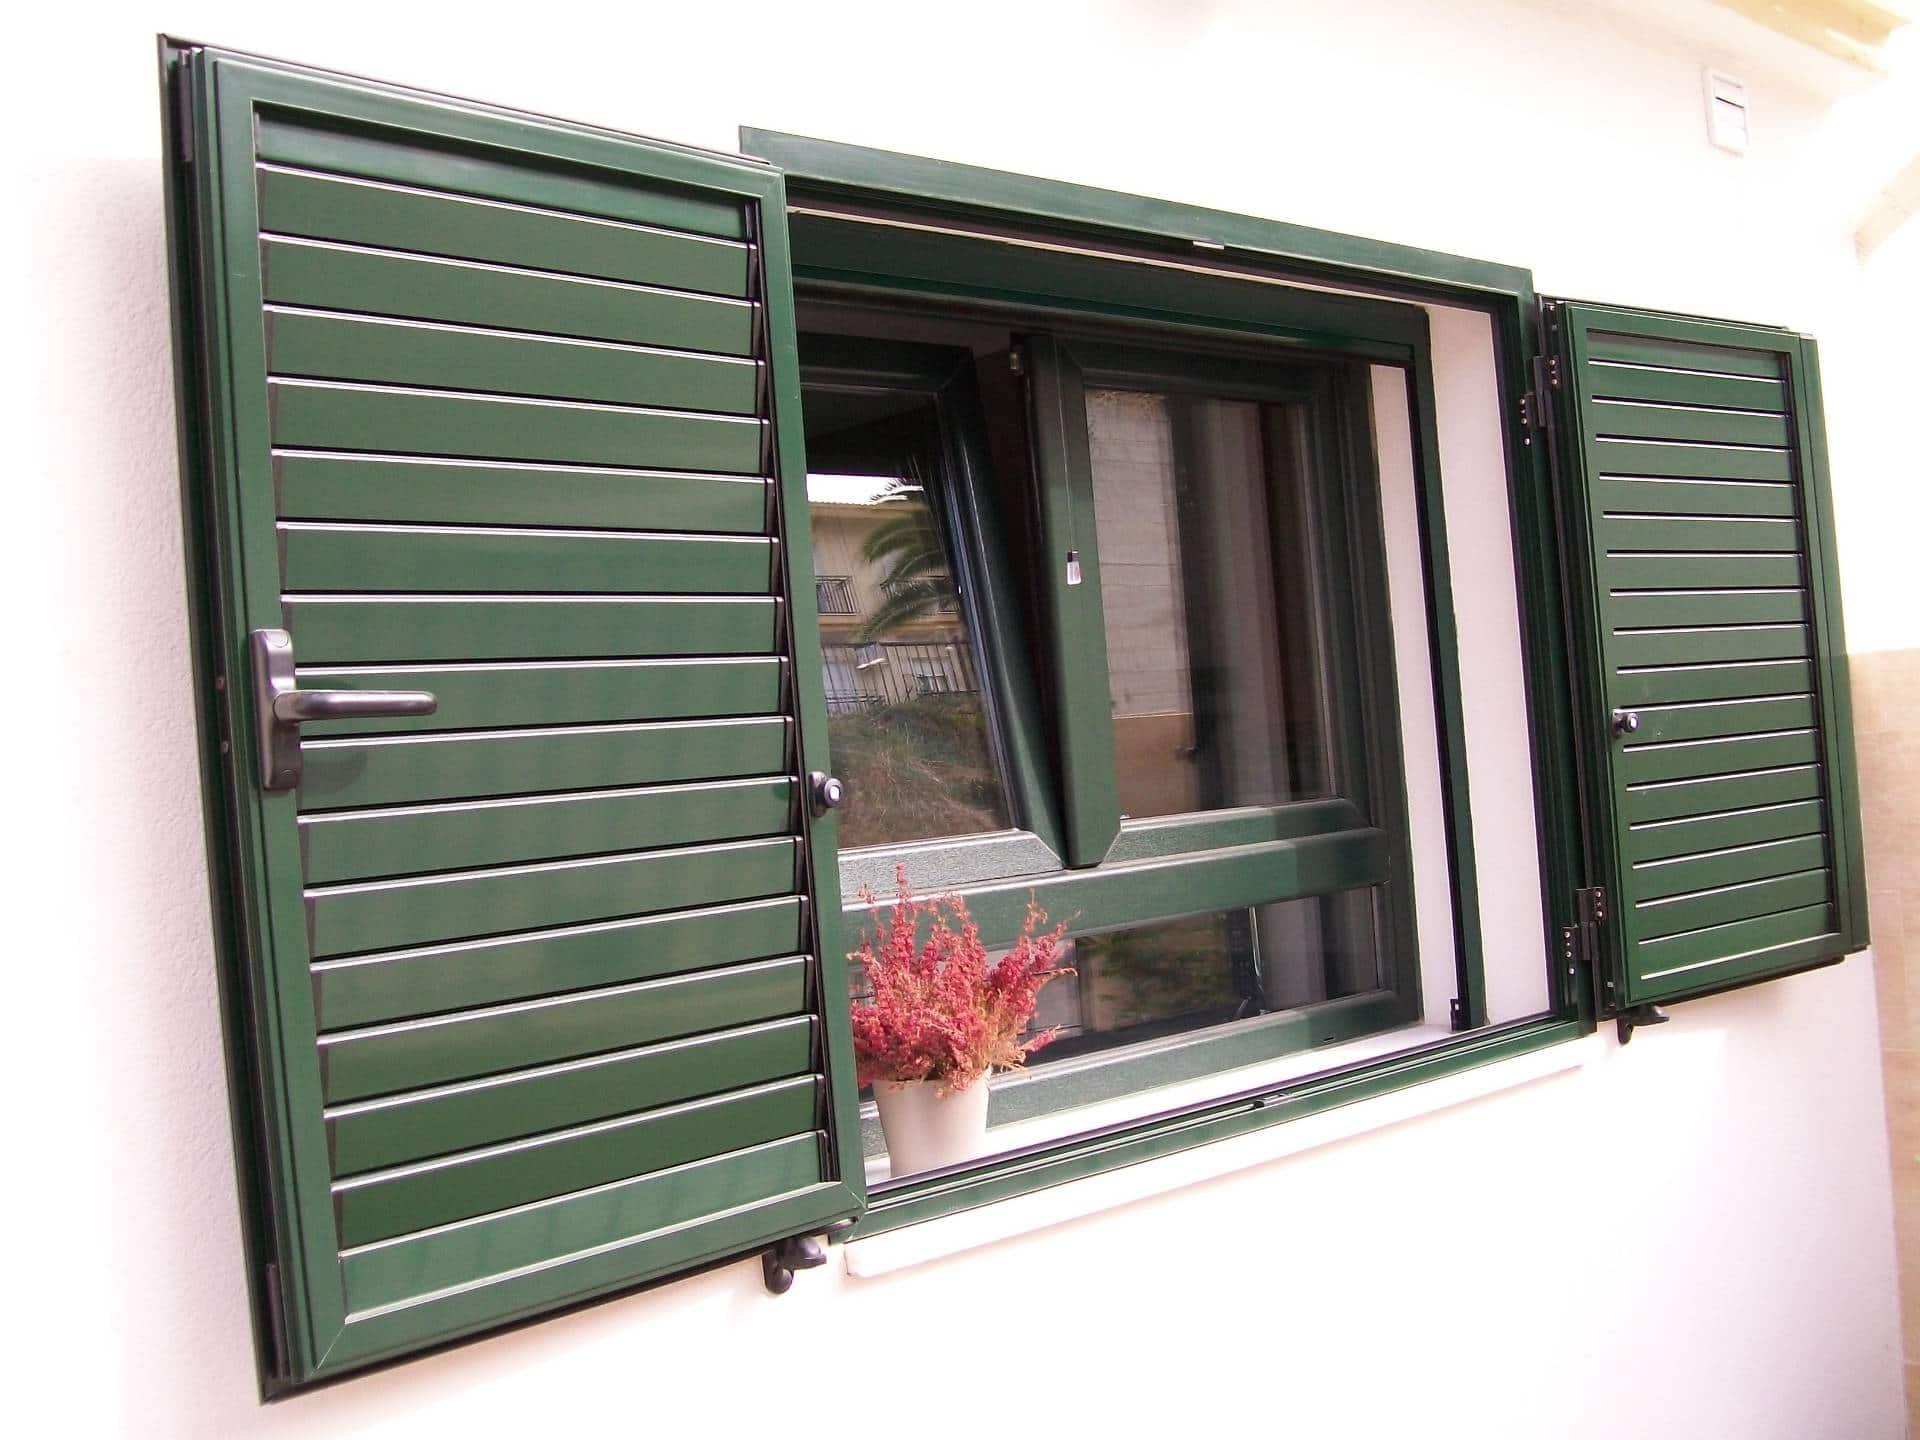 Carpinter a de aluminio instalaci n de ventana y for Carpinteria aluminio